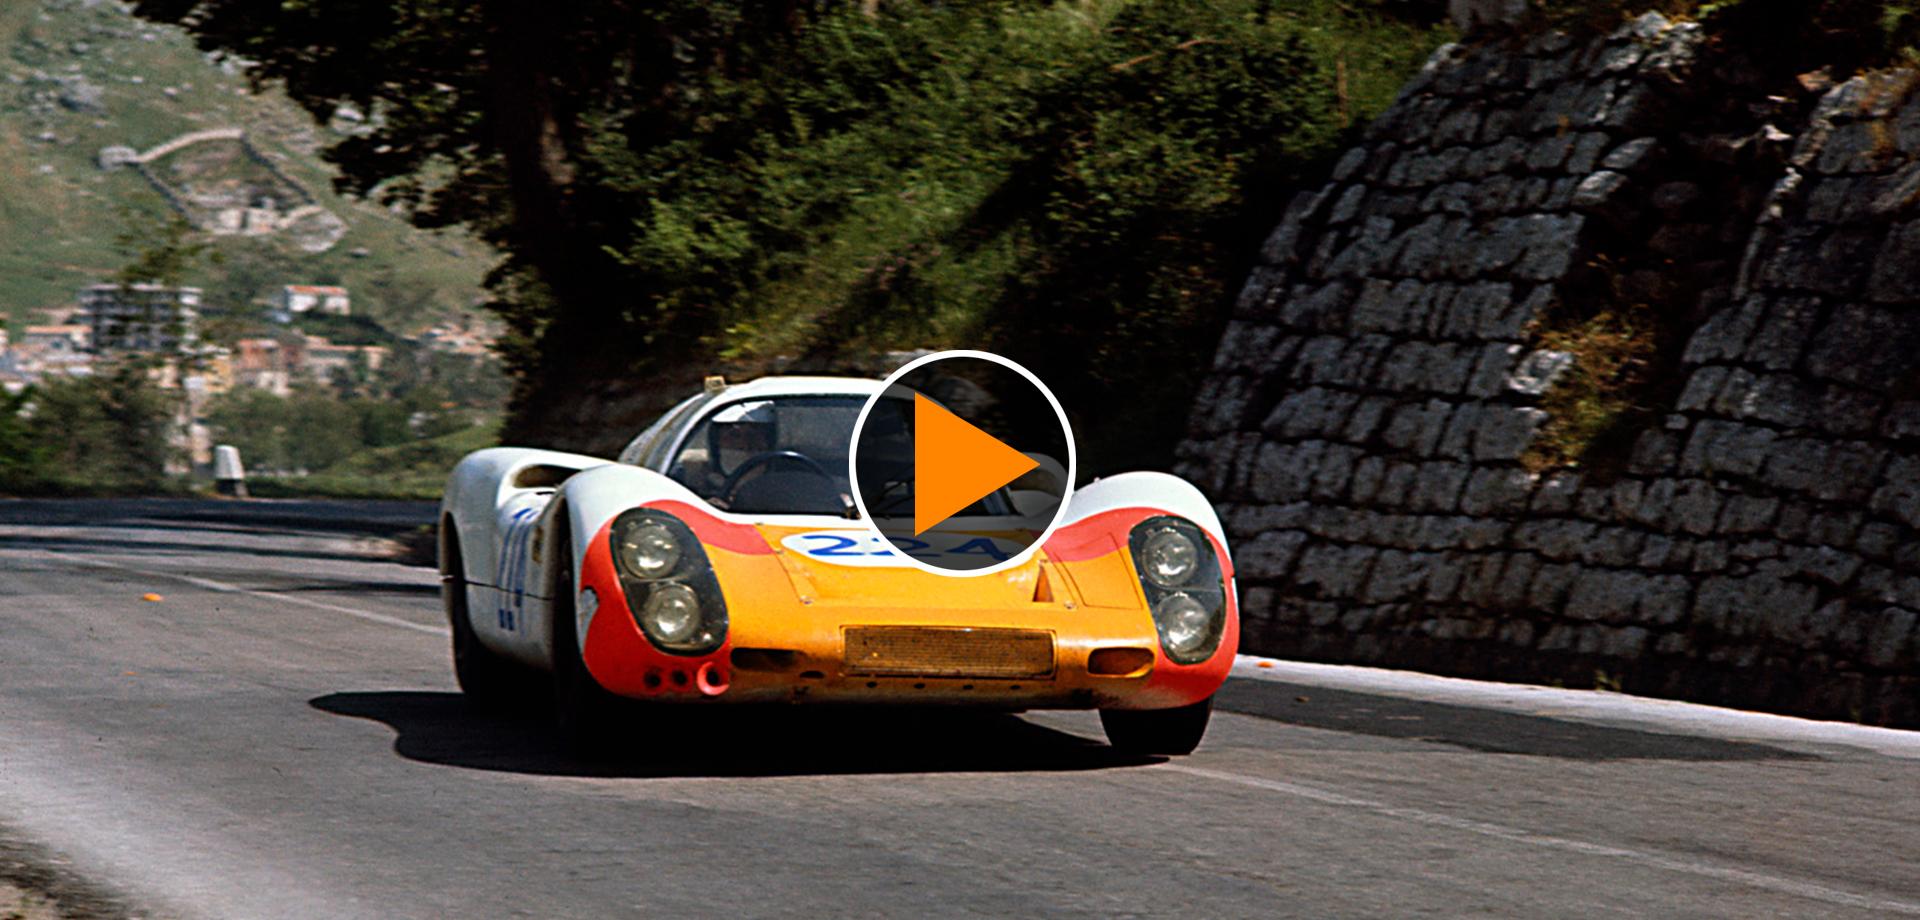 VIC ELFORD, the Golden Age of Motorsport